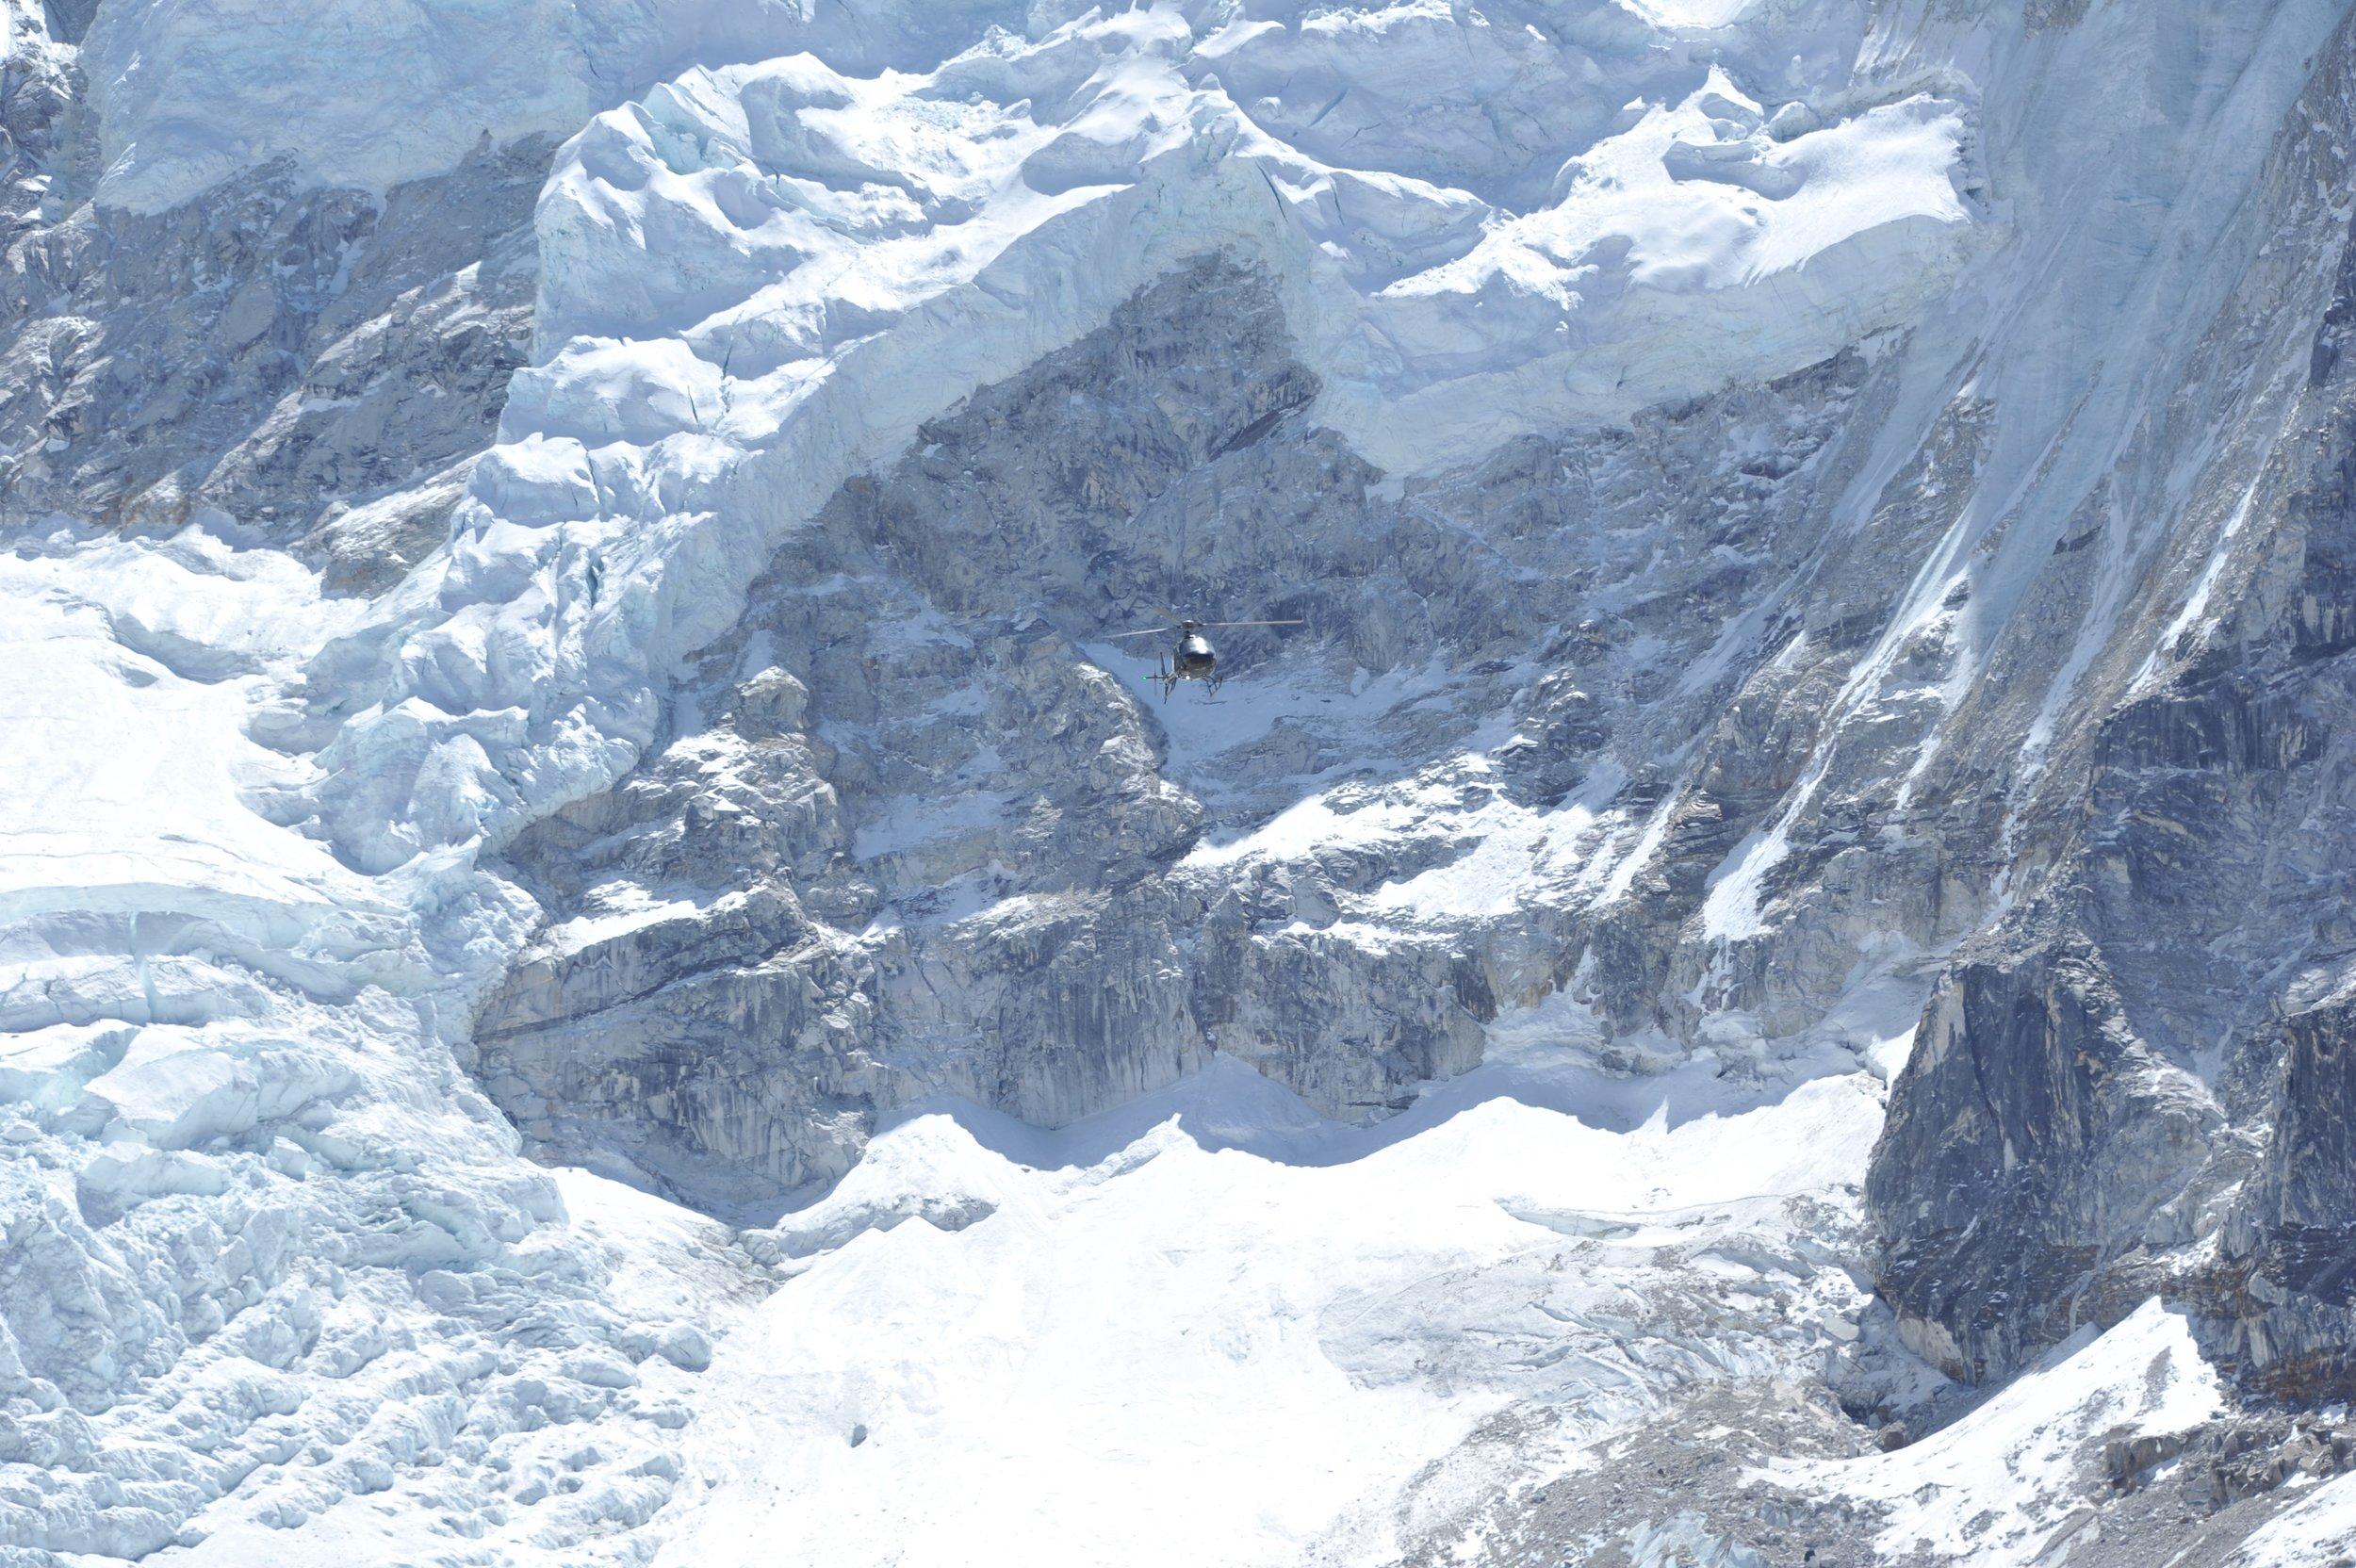 mck nepal 2016 helo over glacier DSC_6931.jpg